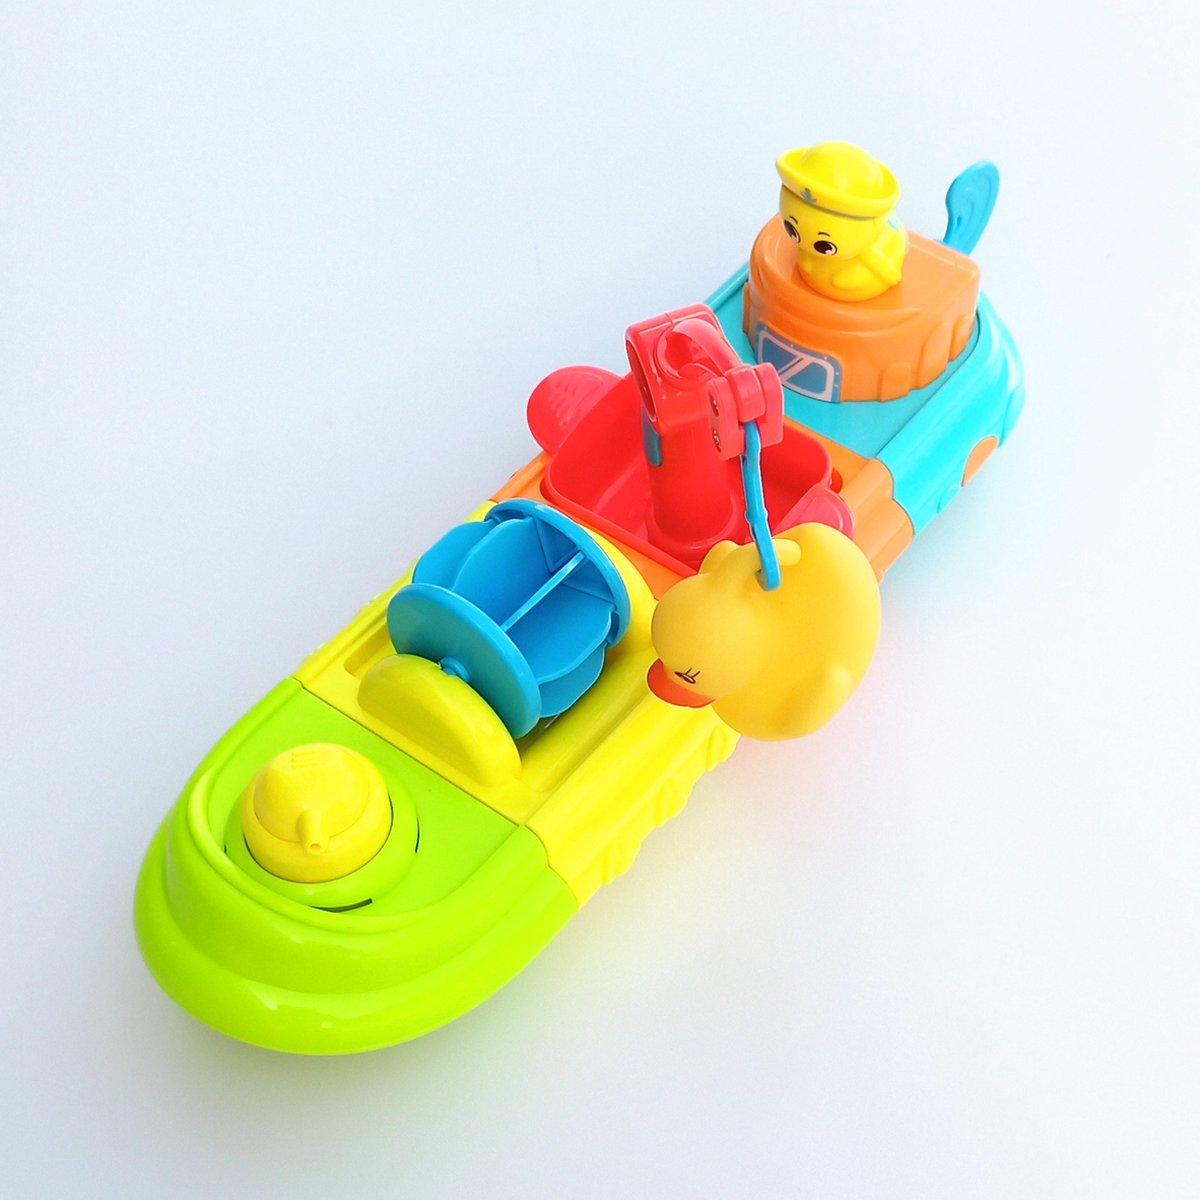 Jobber Waterplay Badspeelgoed - Werk Schip - Assemblage Bad Boot